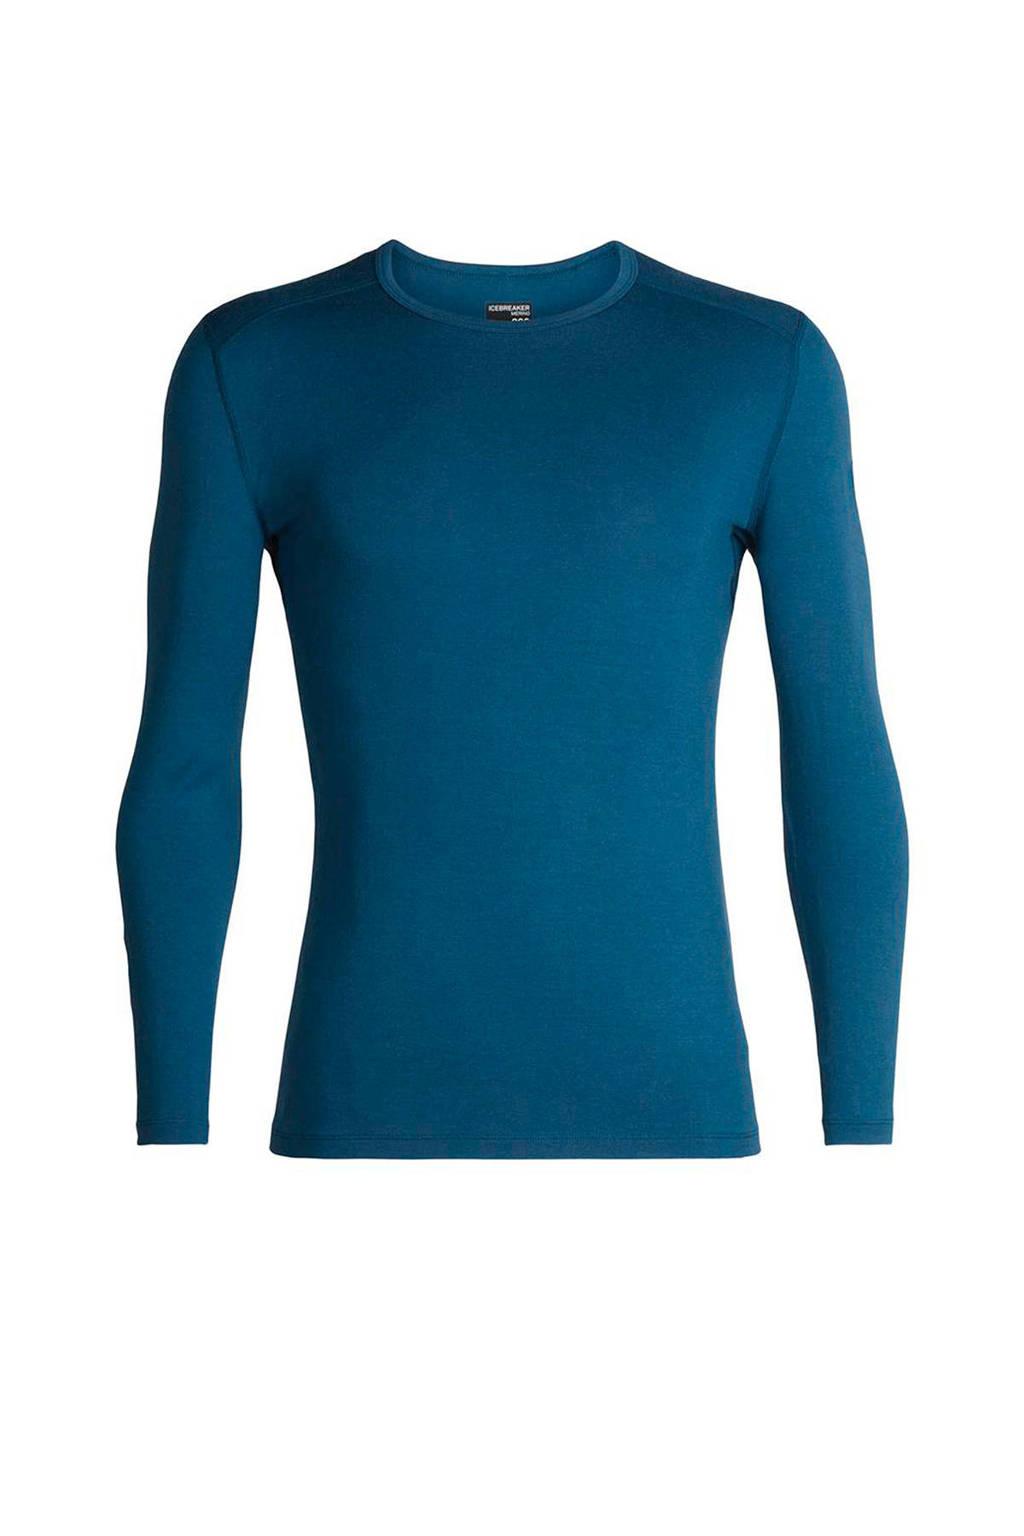 Icebreaker 260 sport T-shirt merino blauw, Prussian Blue